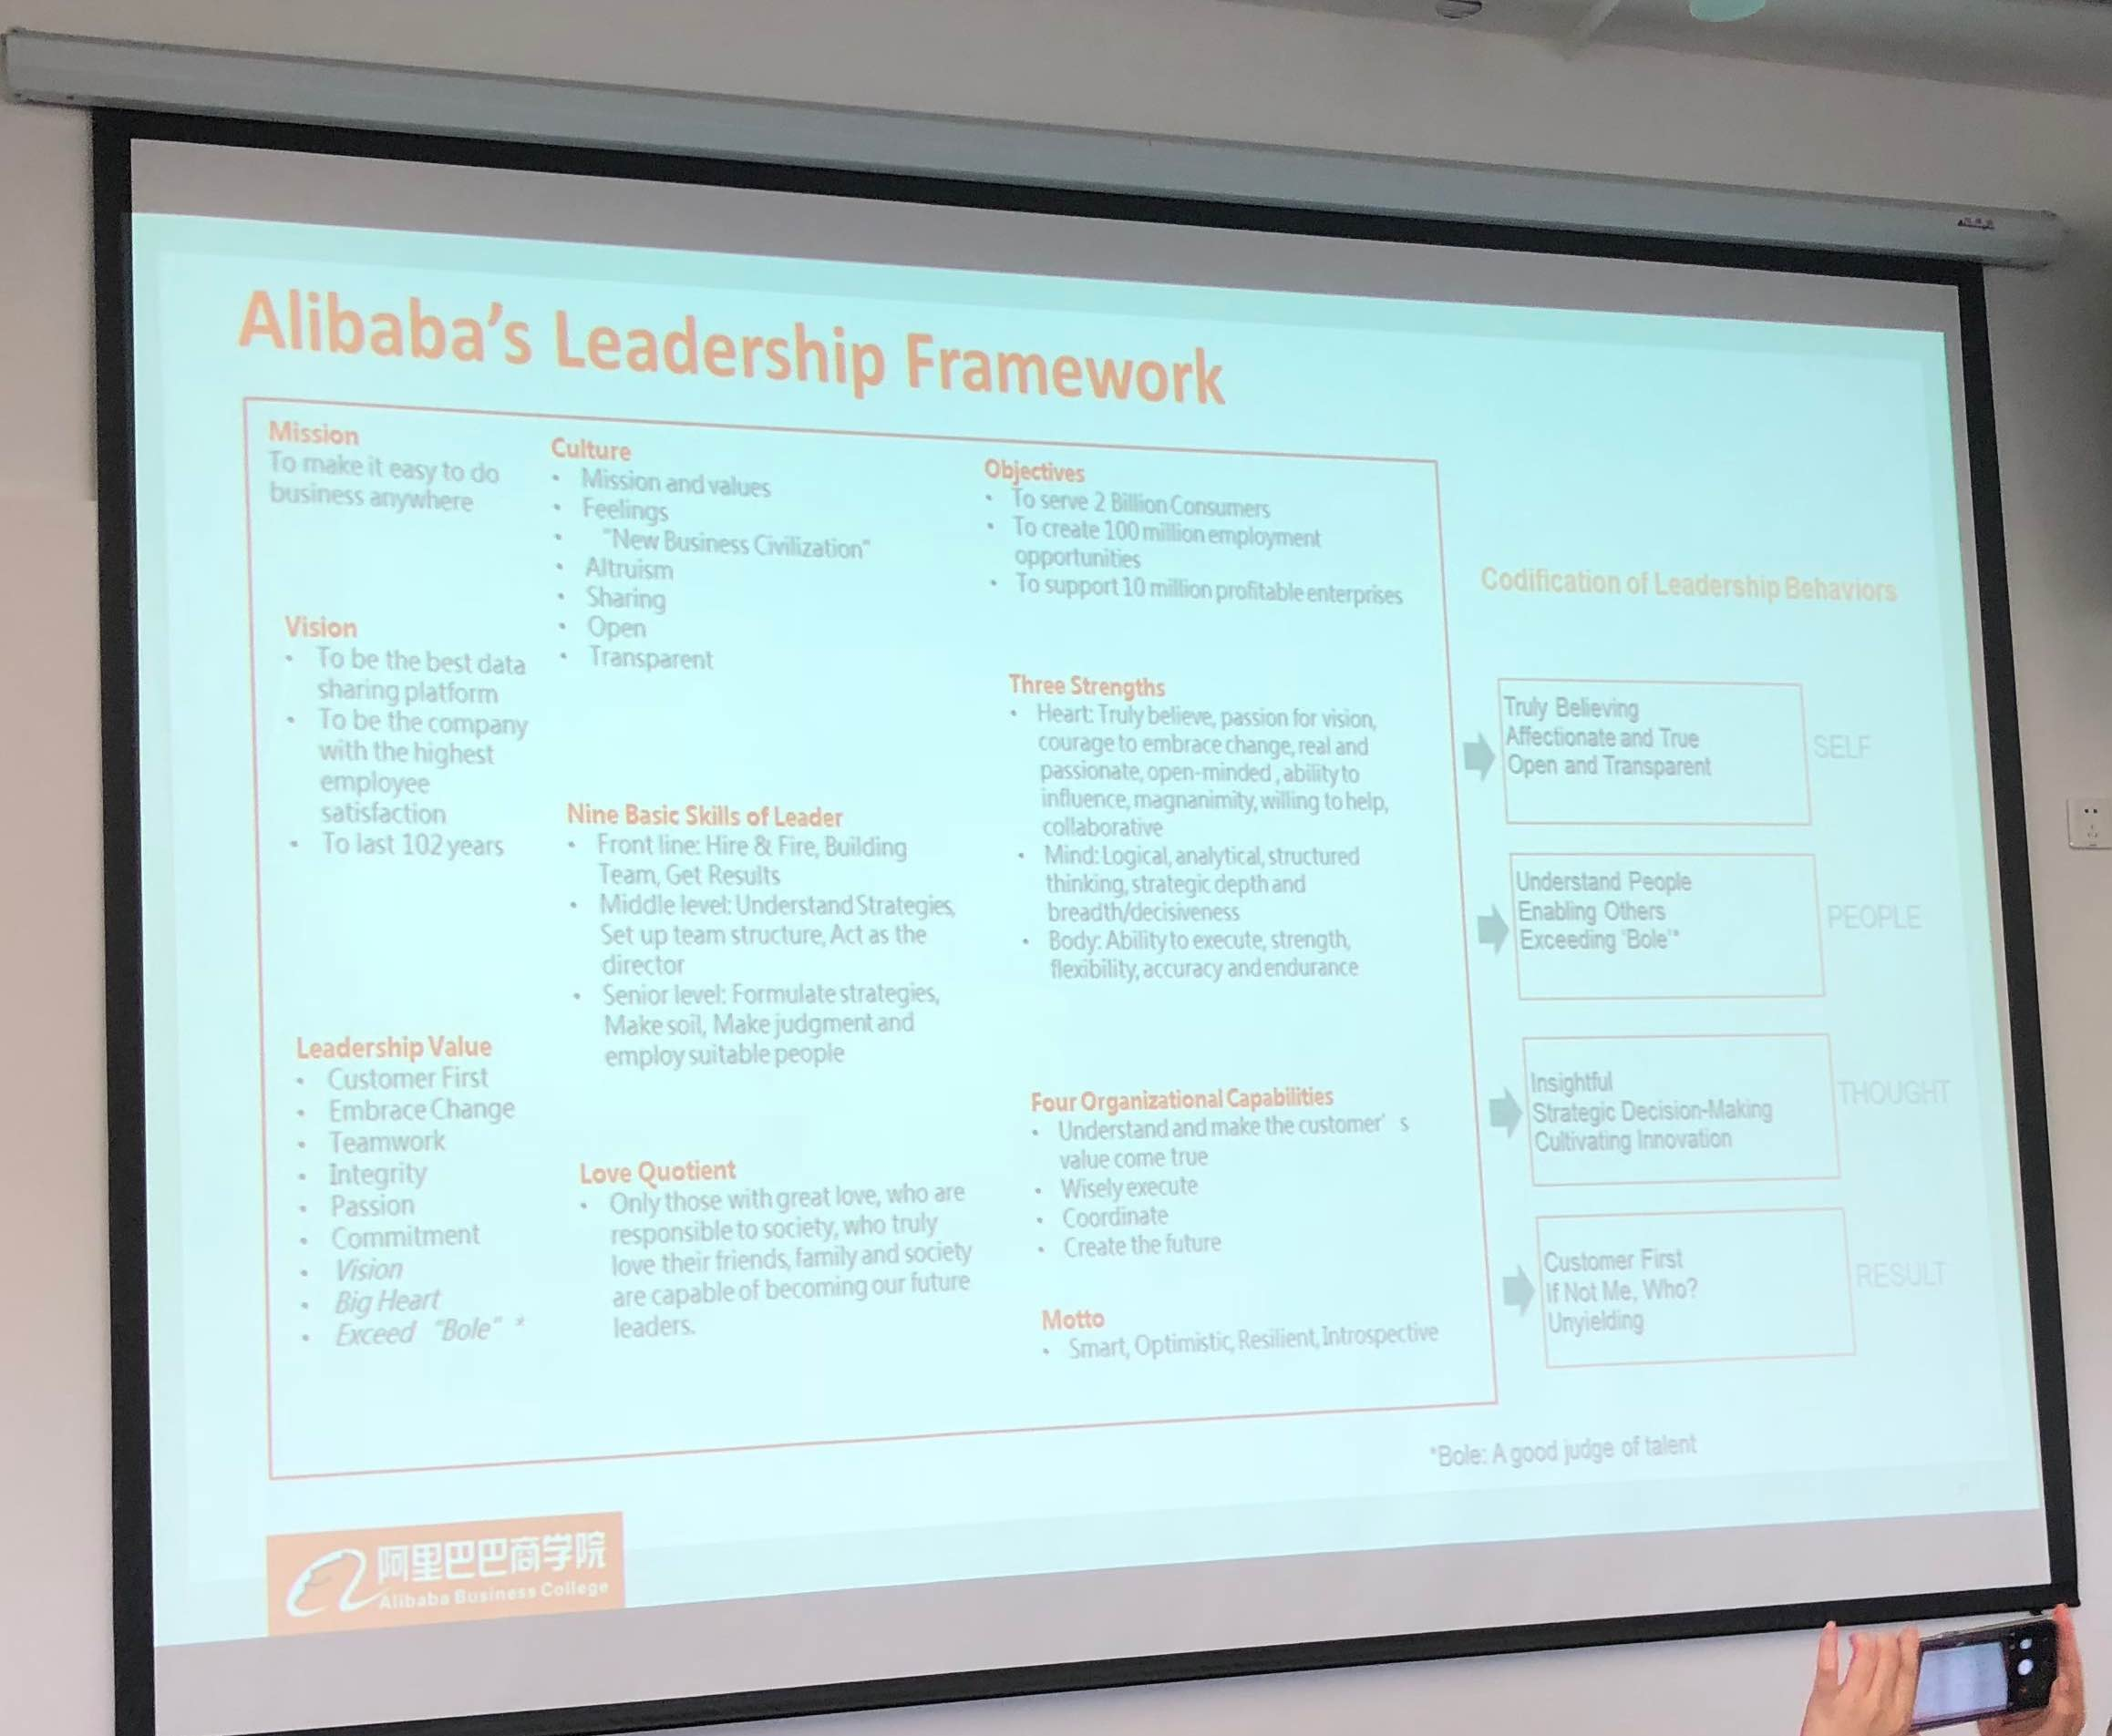 AlibabaLeadershipFramework